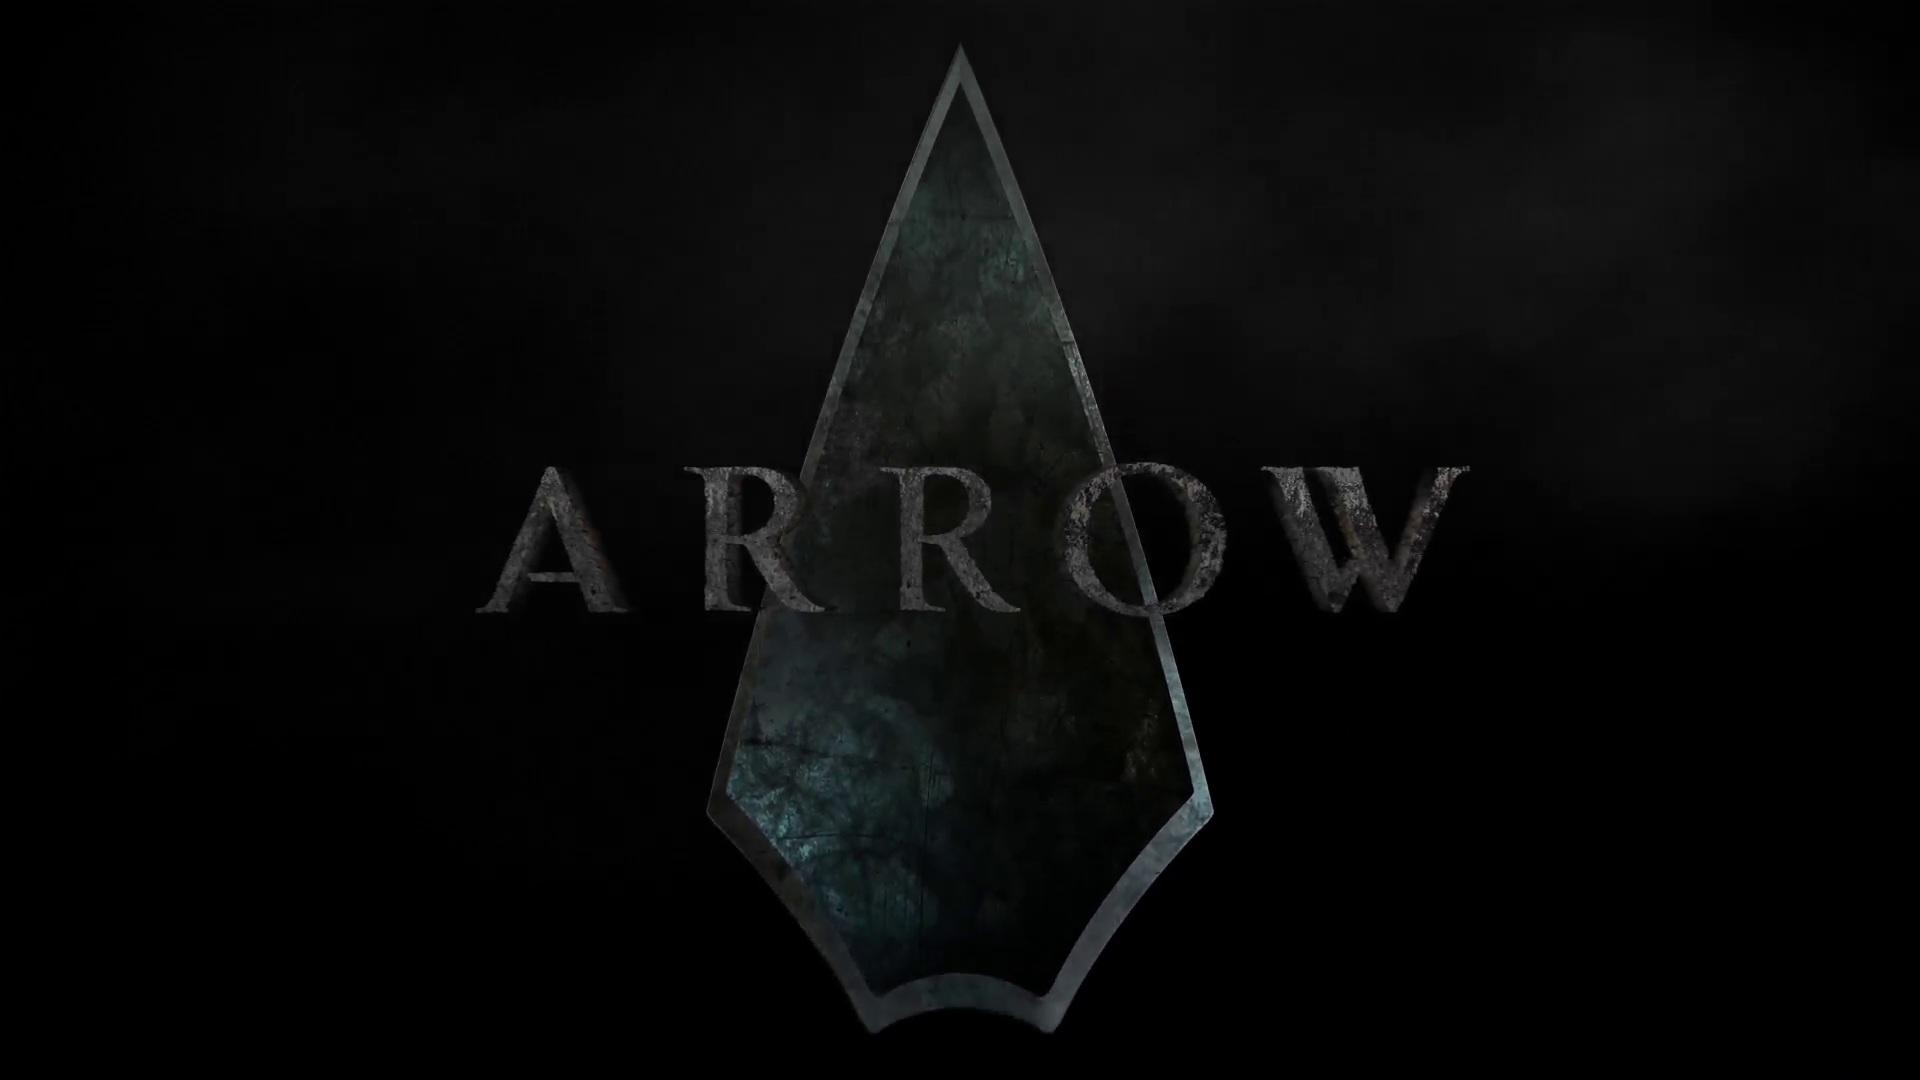 Arrow wallpaper 2